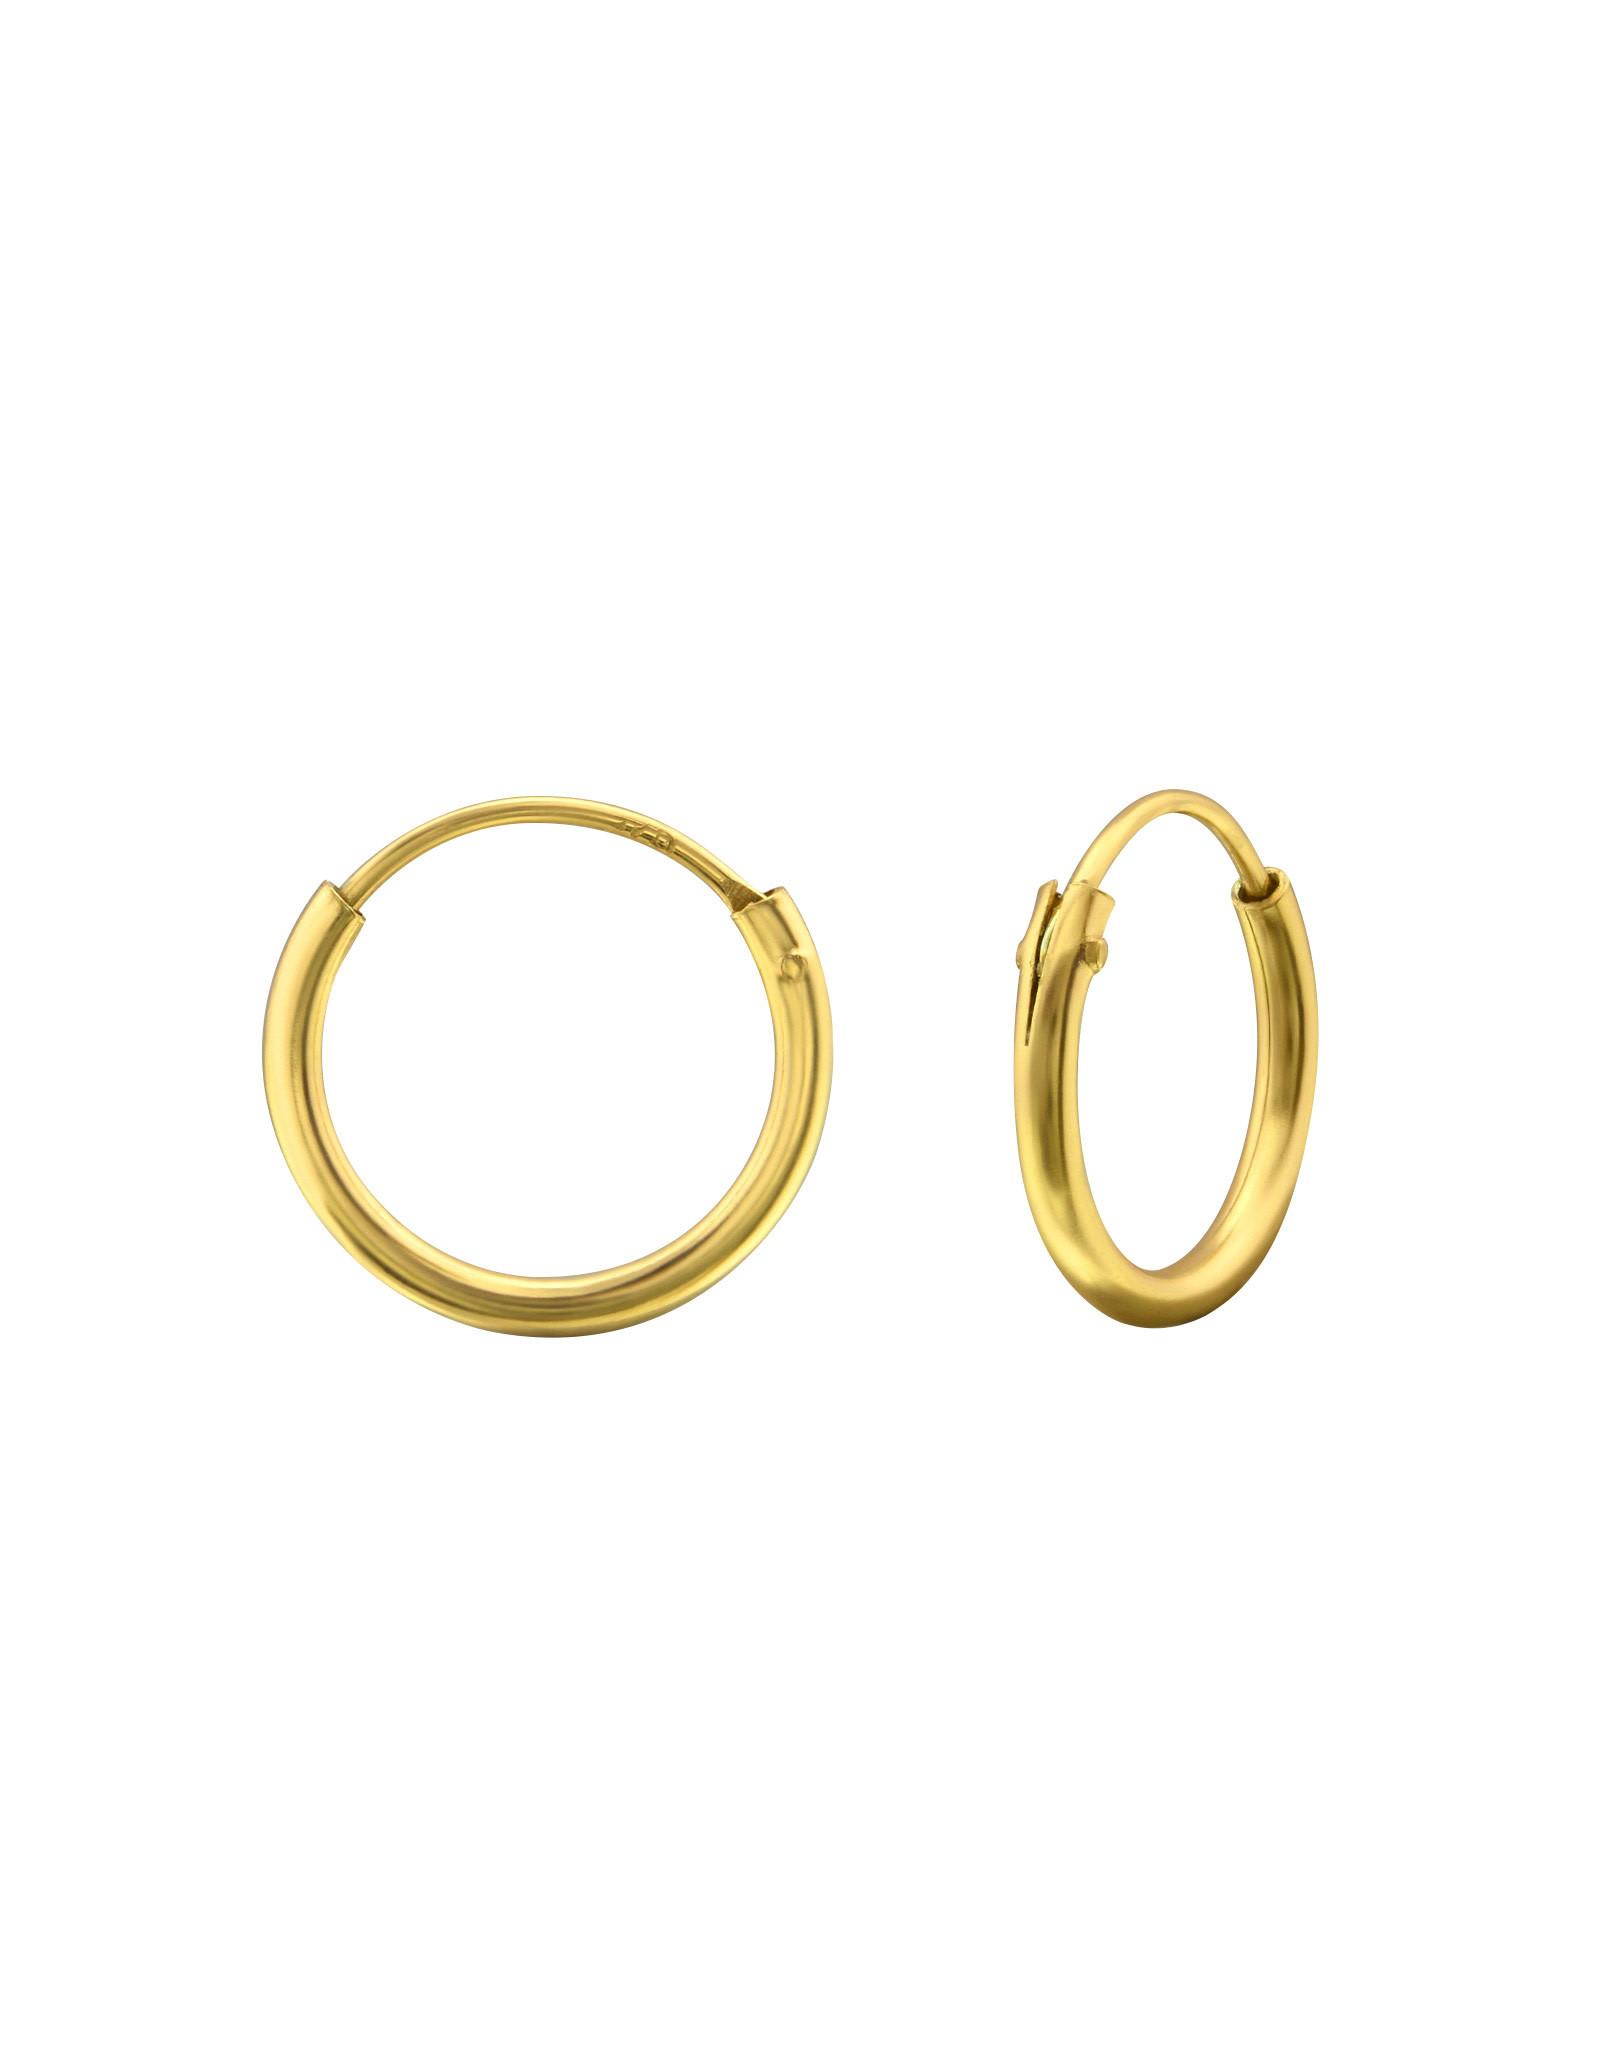 Ringetjes verguld 12mm